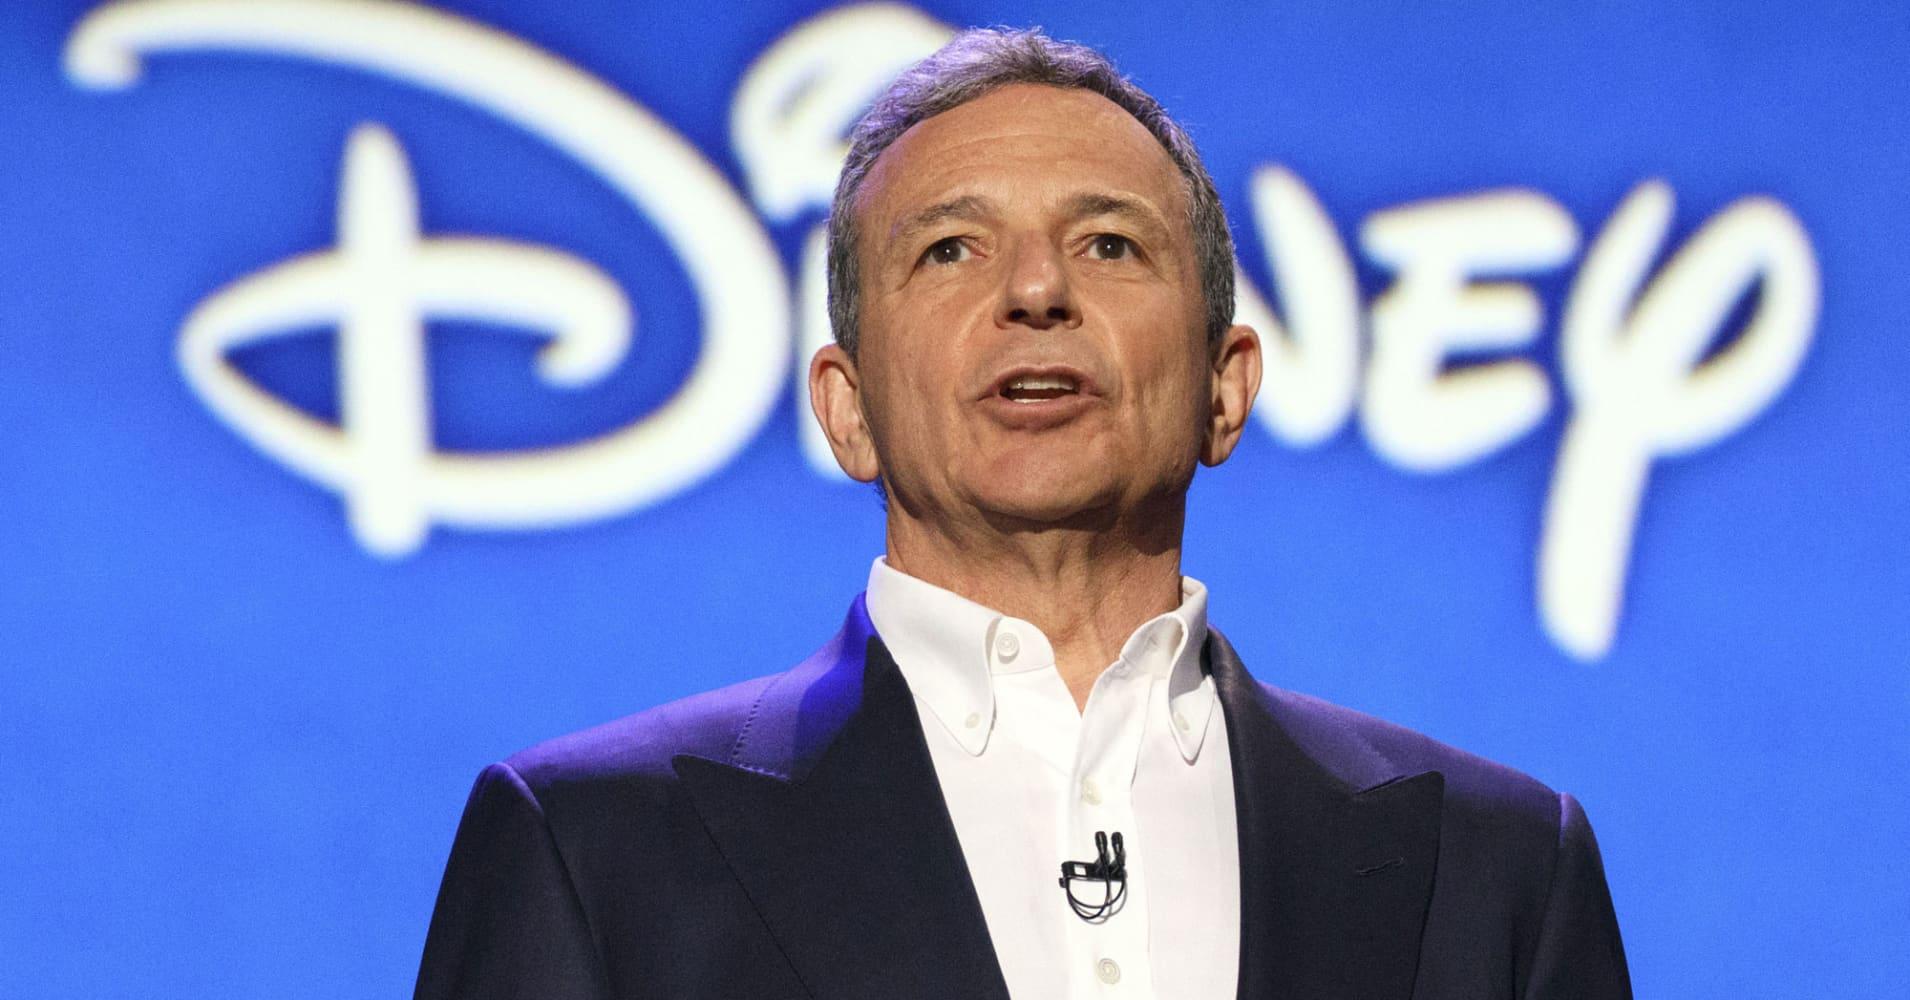 Disney announces strategic reorganization effective immediately biocorpaavc Choice Image